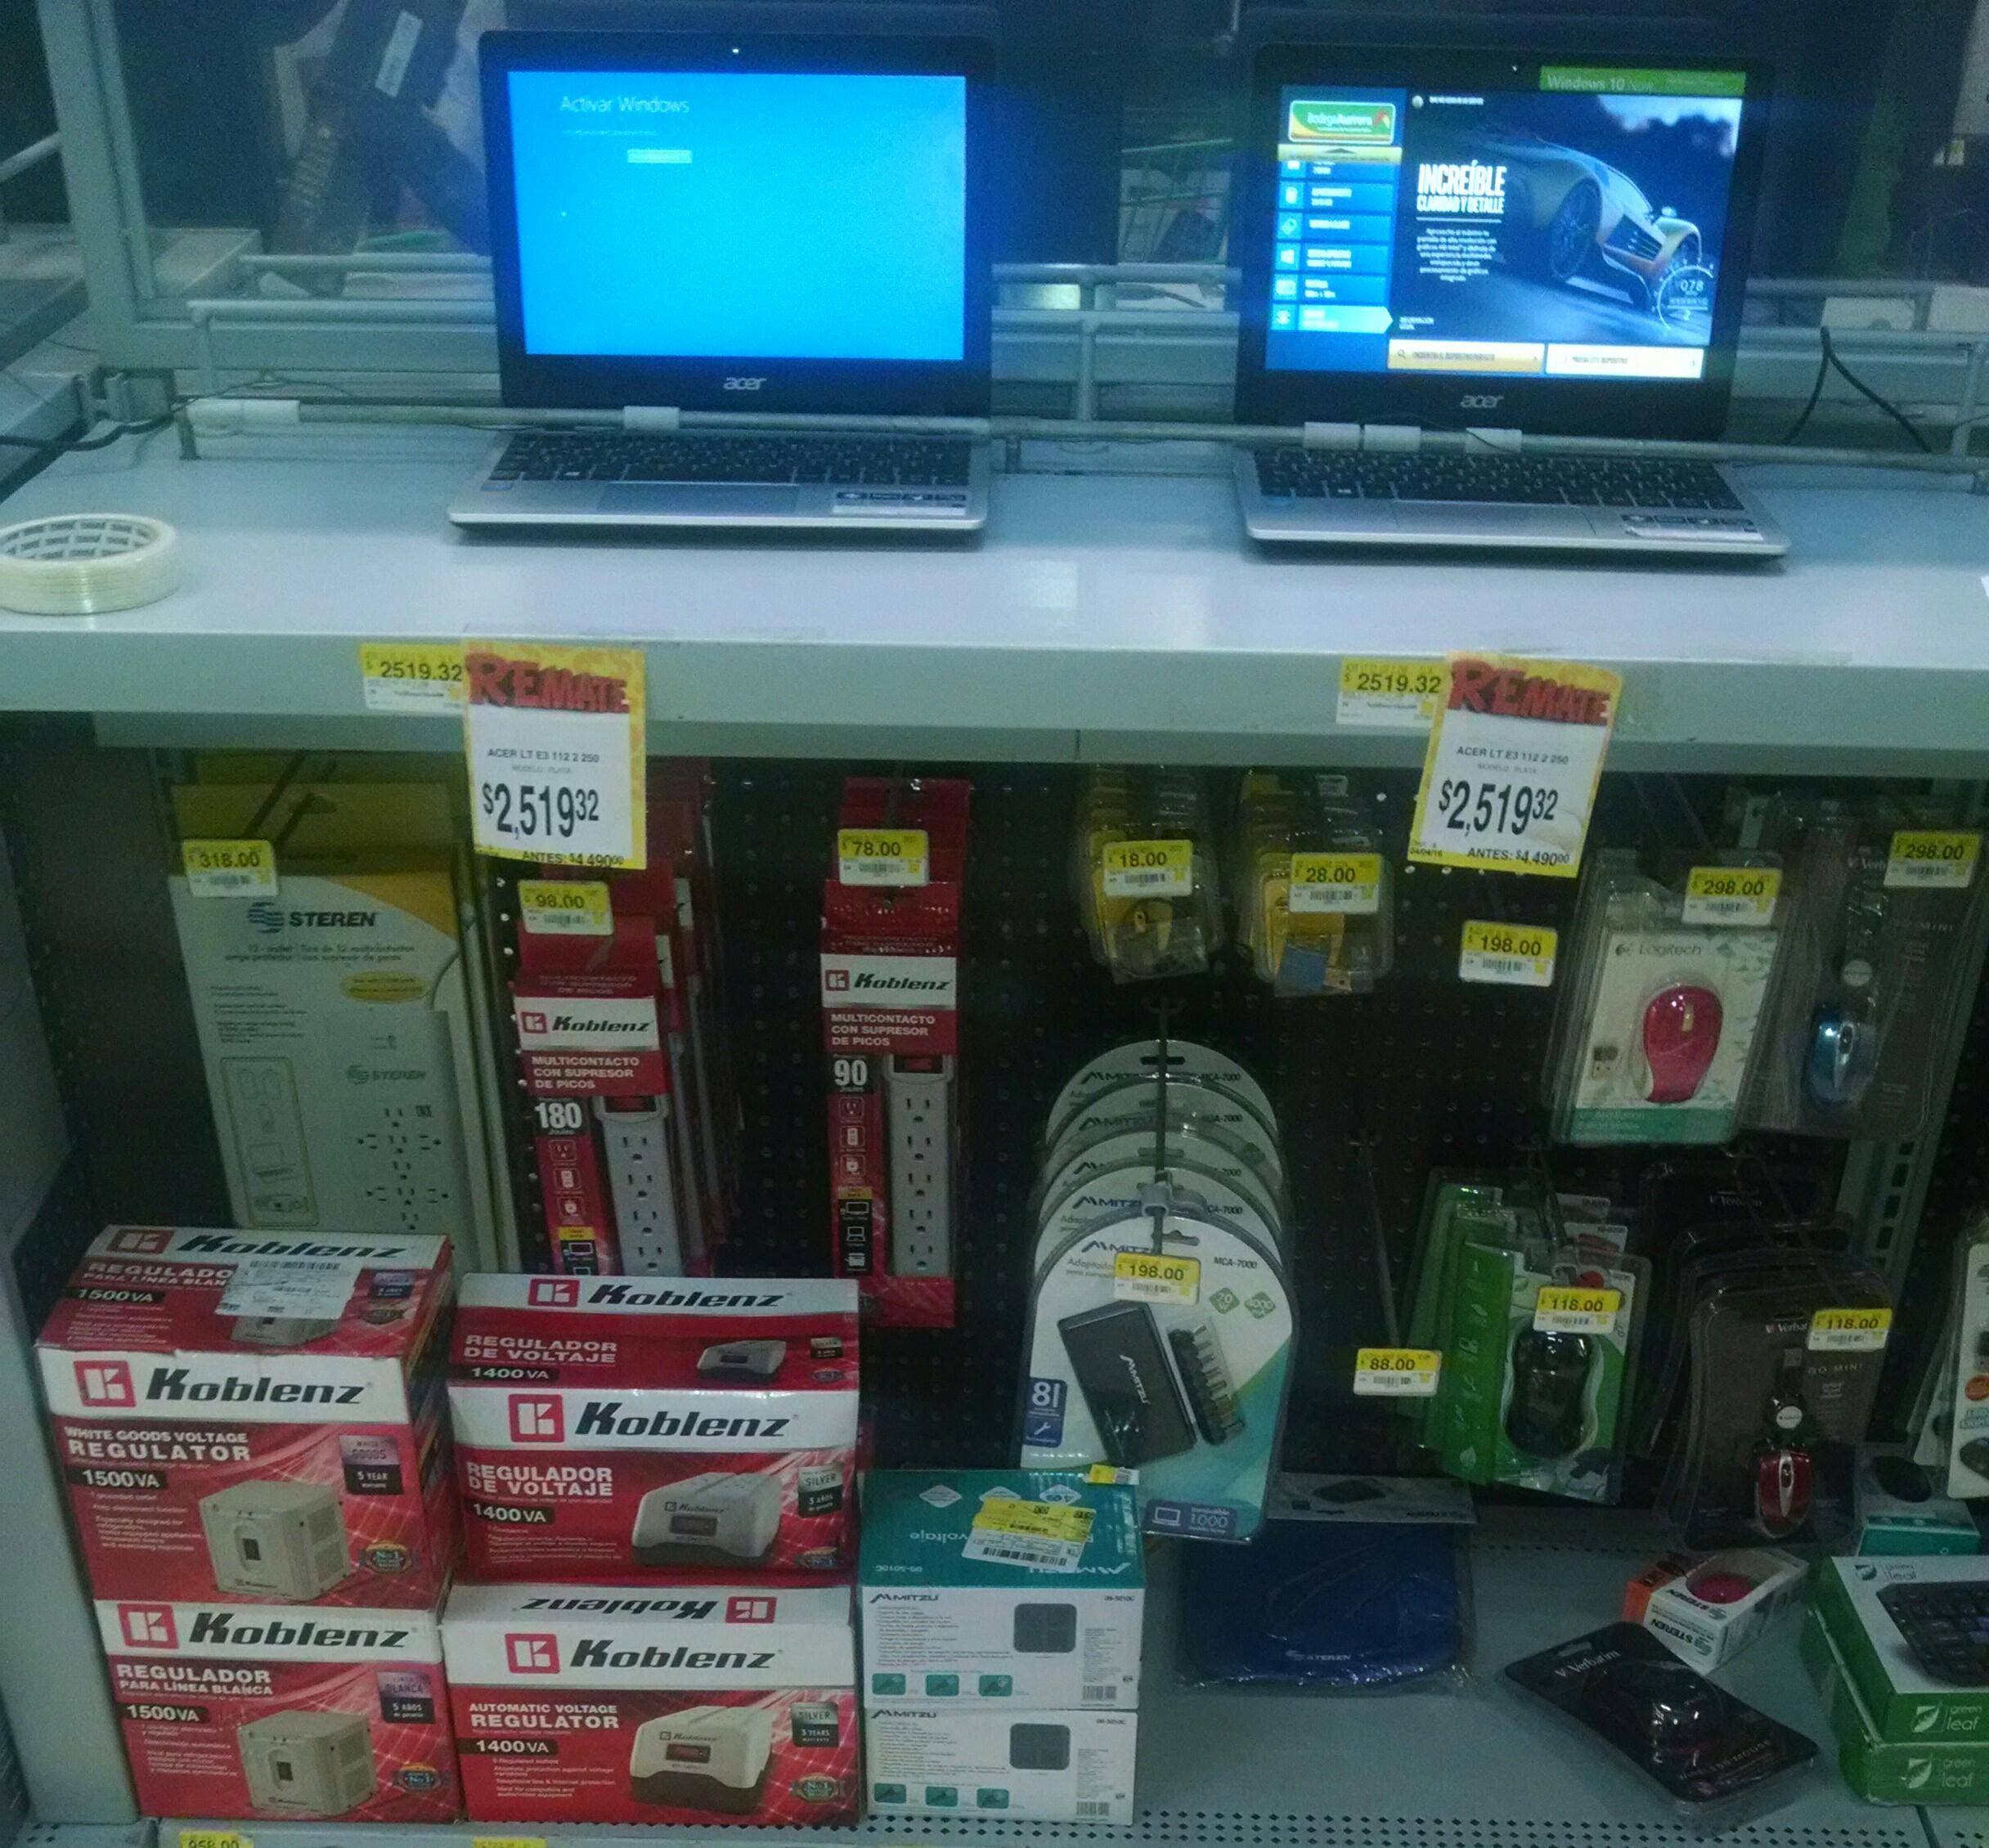 Bodega Aurrerá: Notebook Acer lt e3 a $2,519